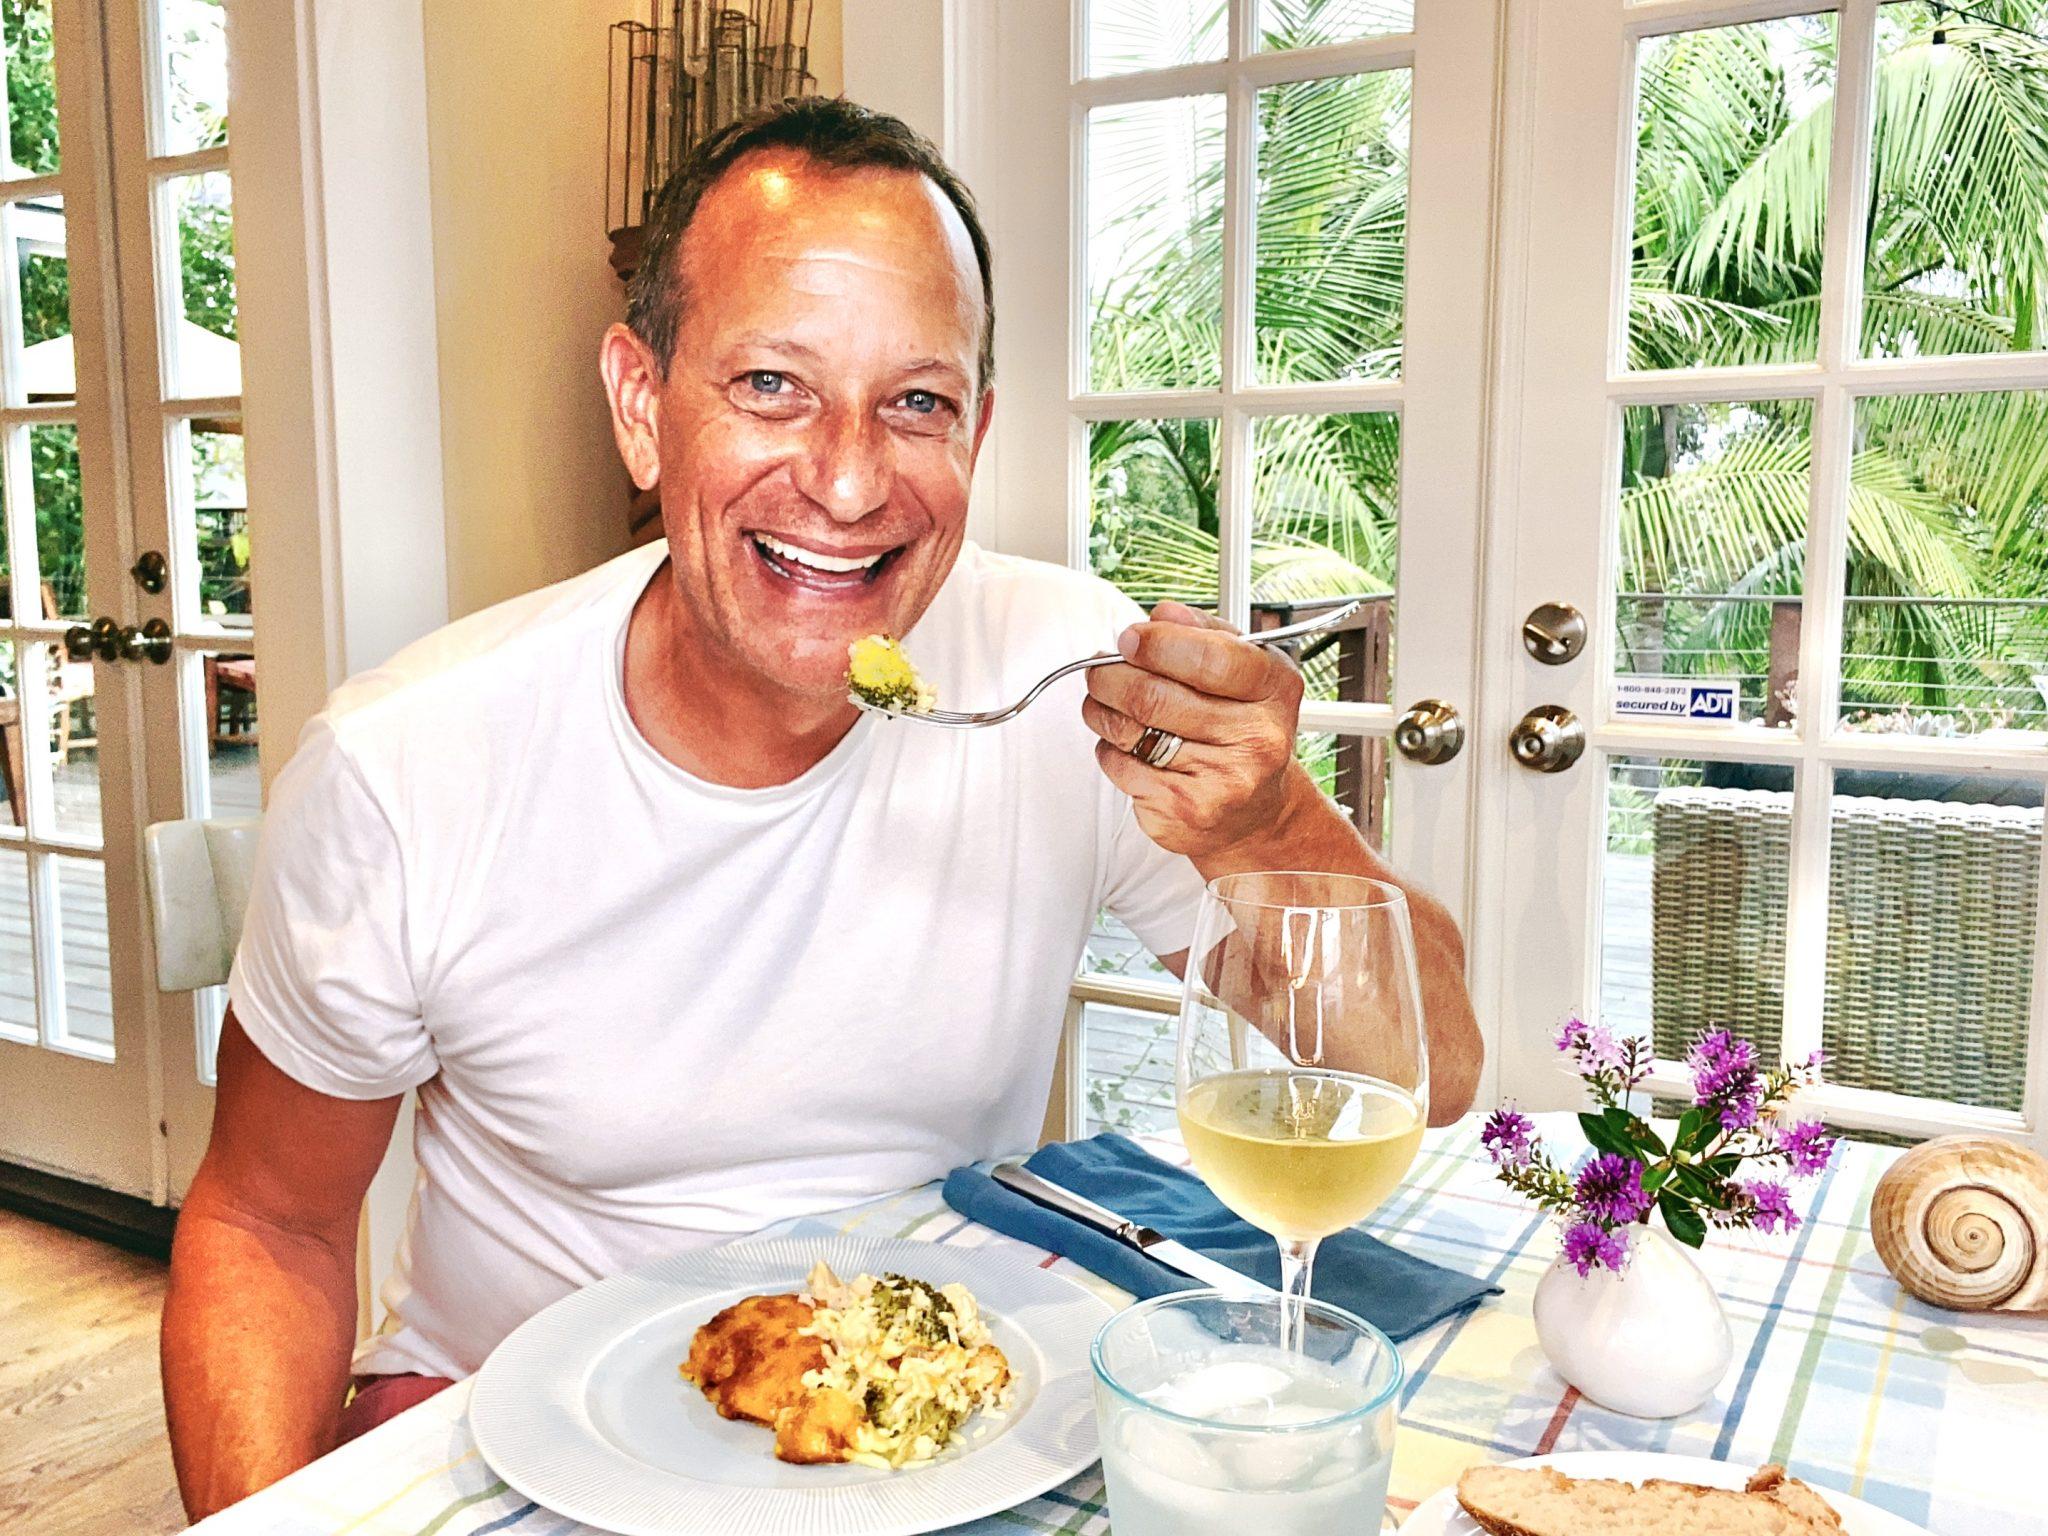 man smiling at camera while sampling Healthy Chicken & Rice Bake with Broccoli Recipe